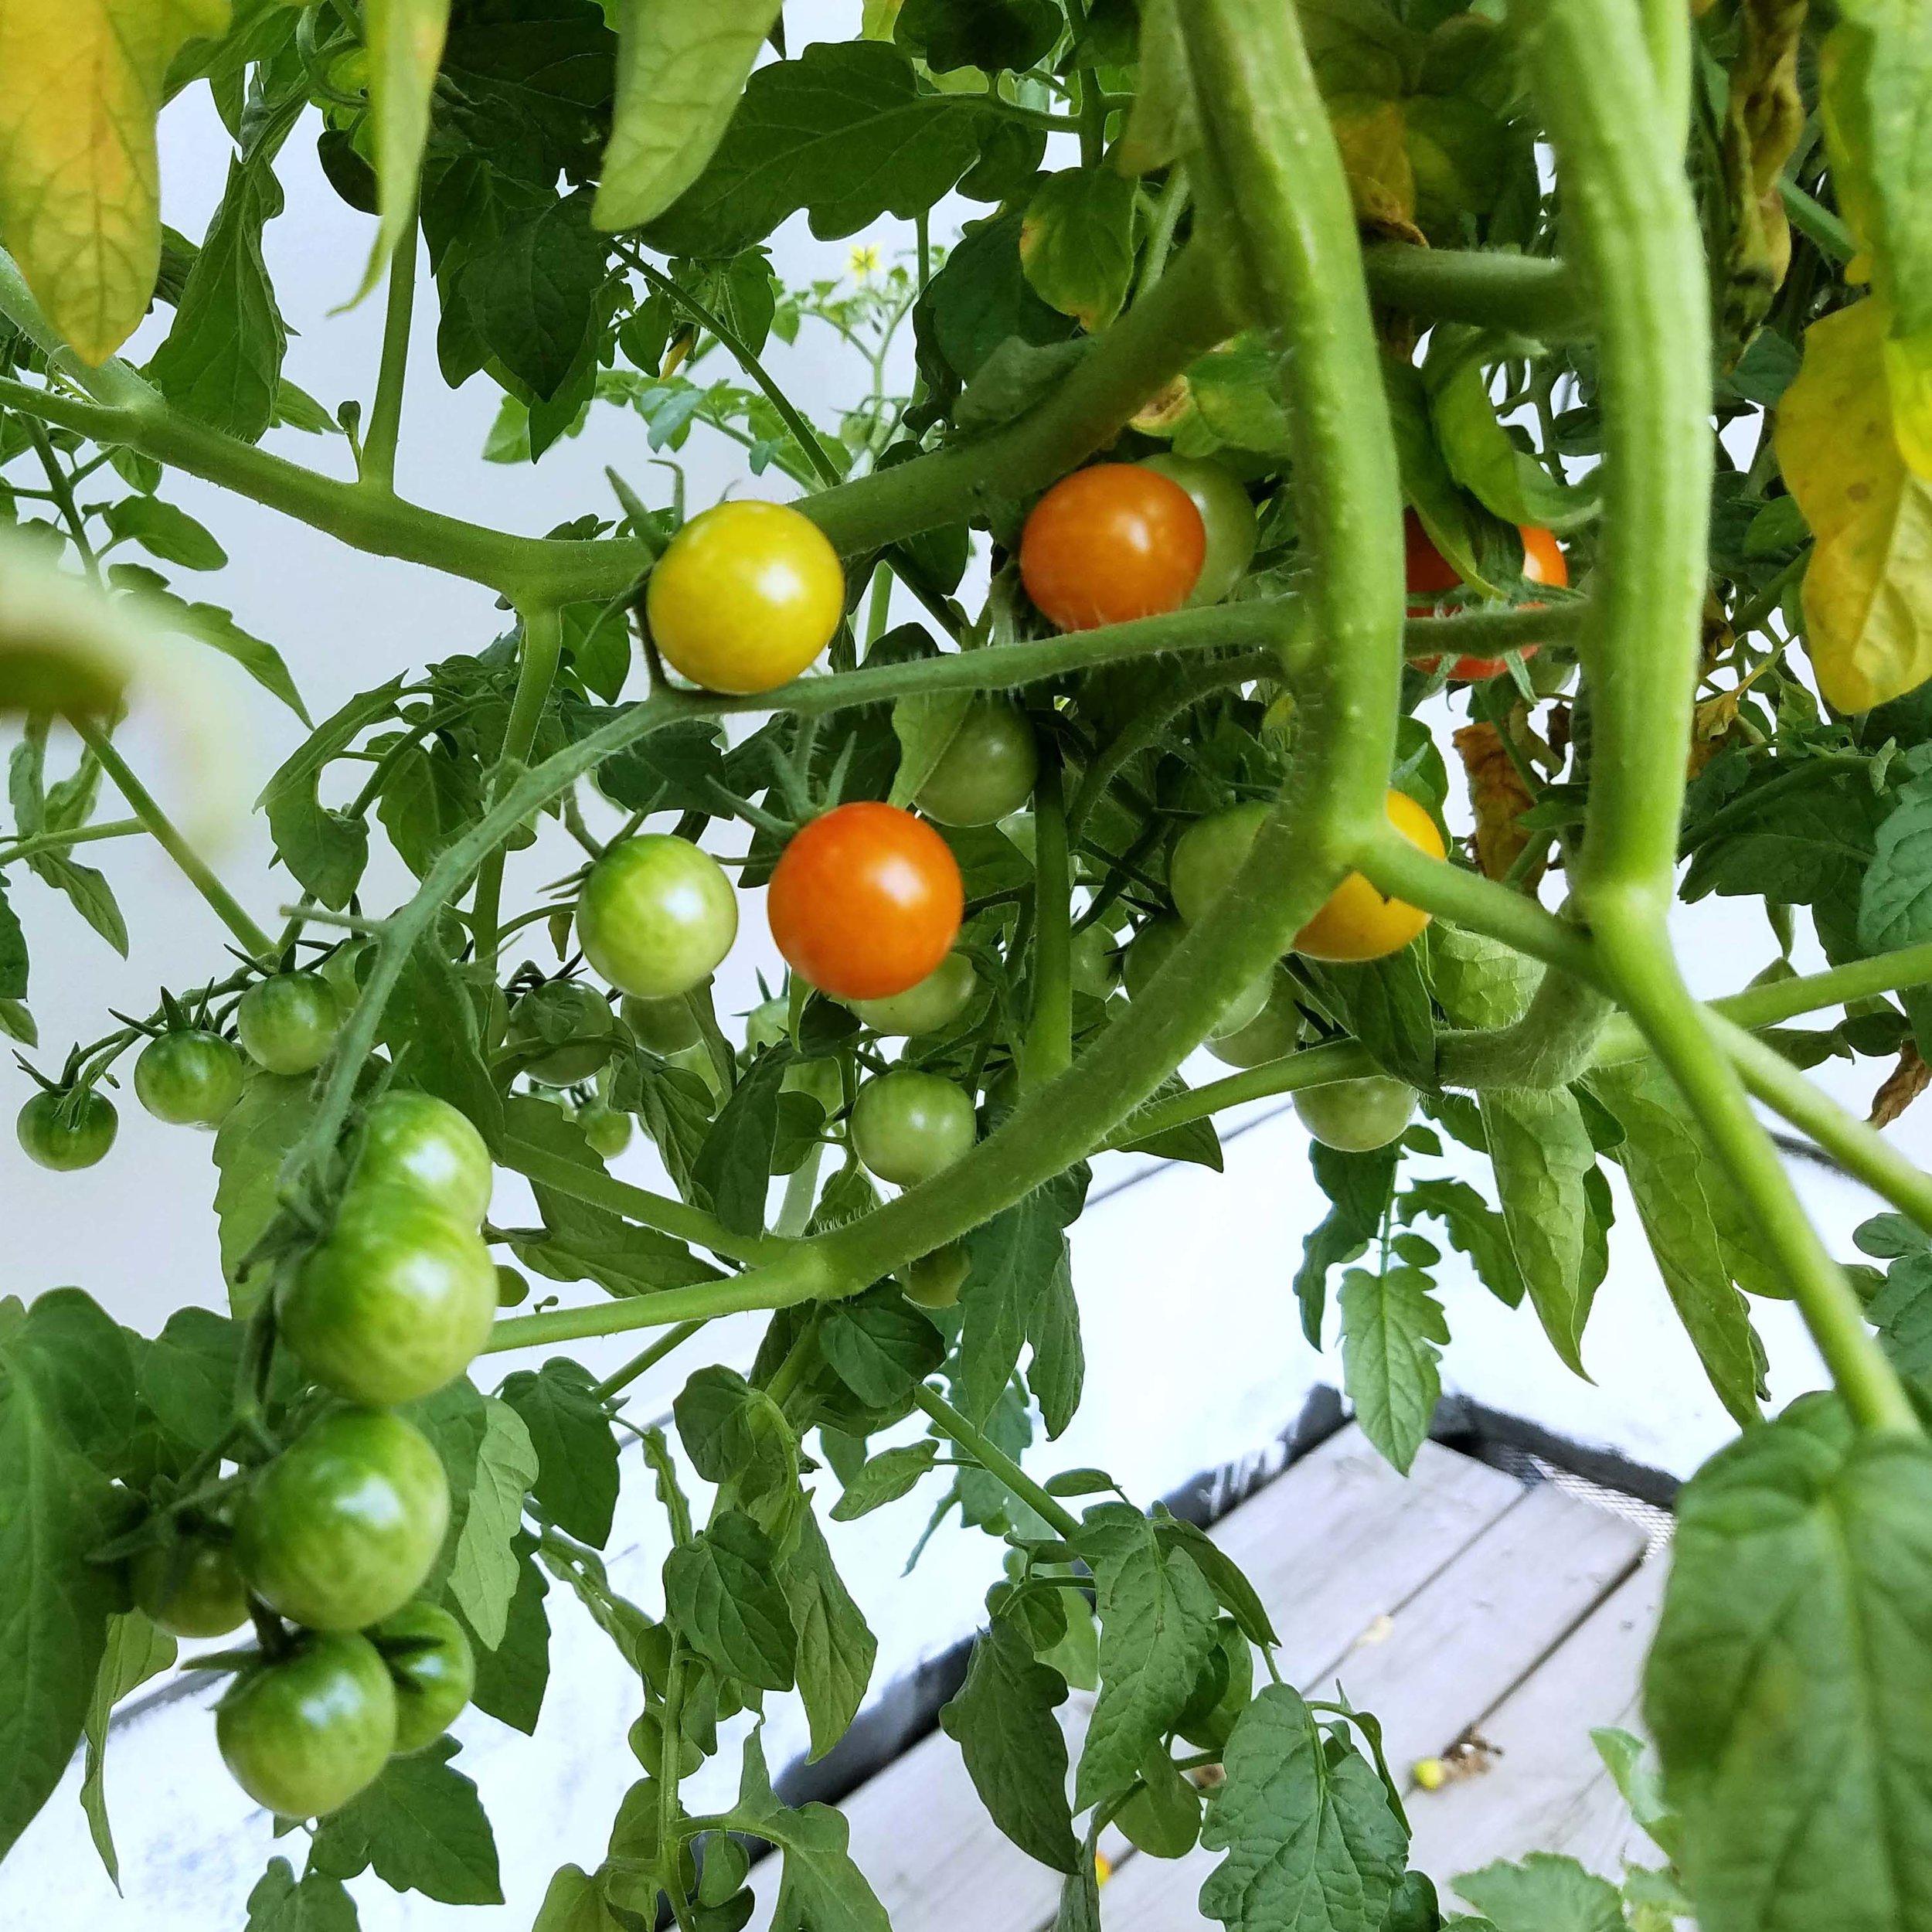 Tonsoftomatoes.jpg